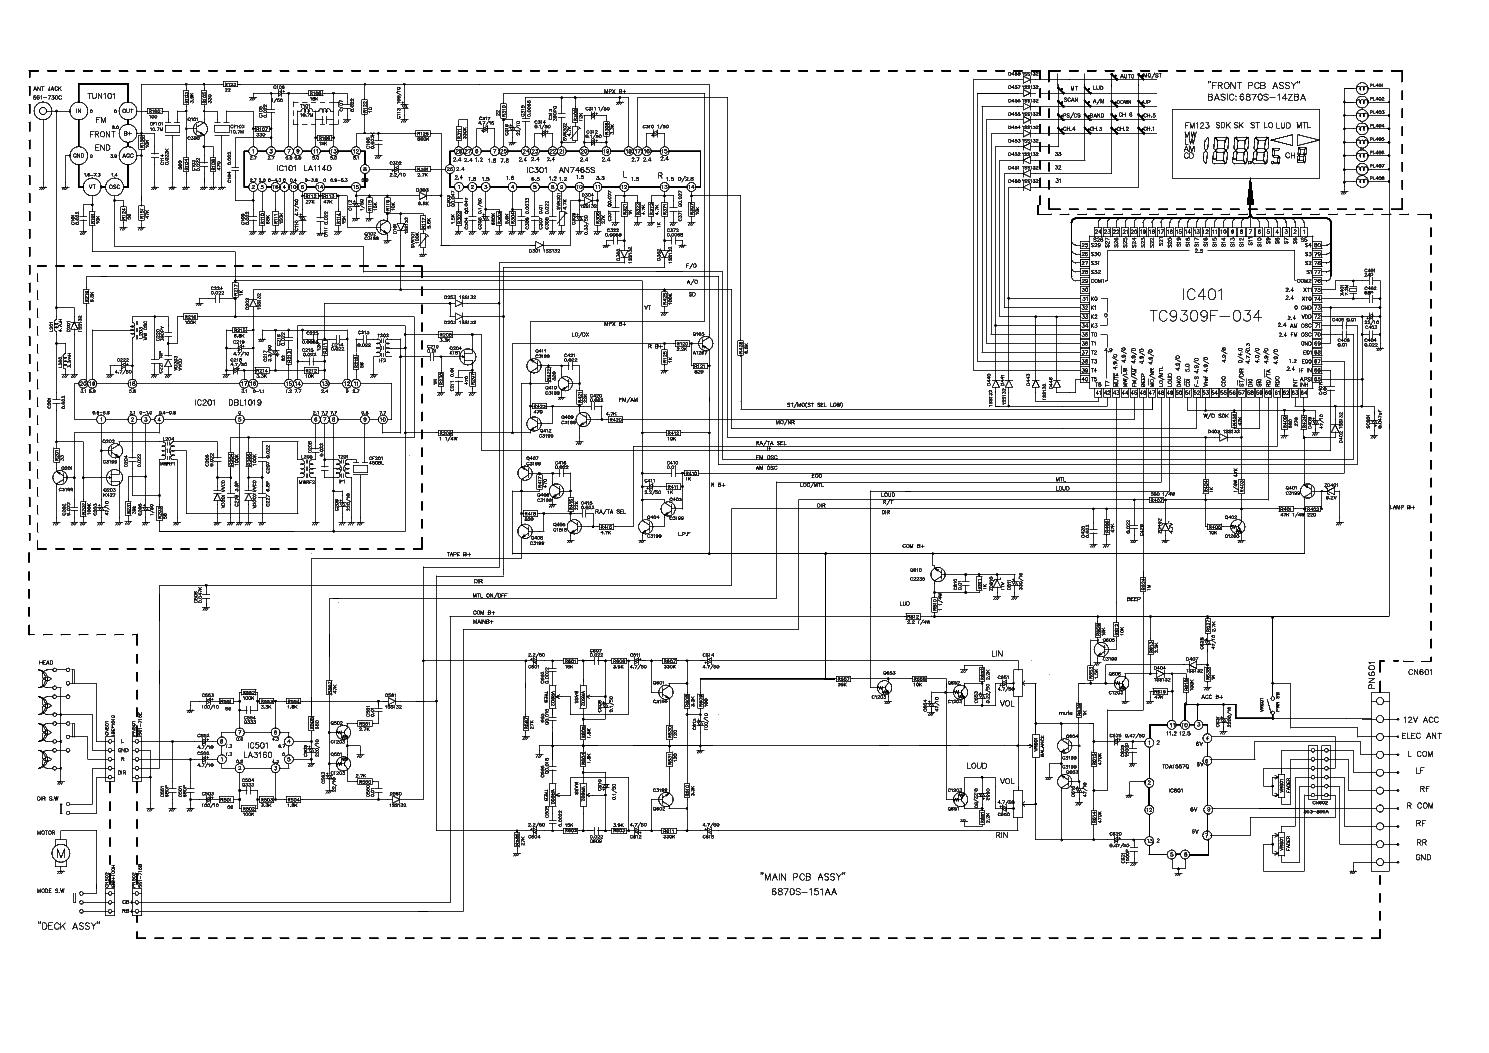 lg tcc 320 service manual download schematics eeprom repair info rh elektrotanya com LG View LG Safelink Phone